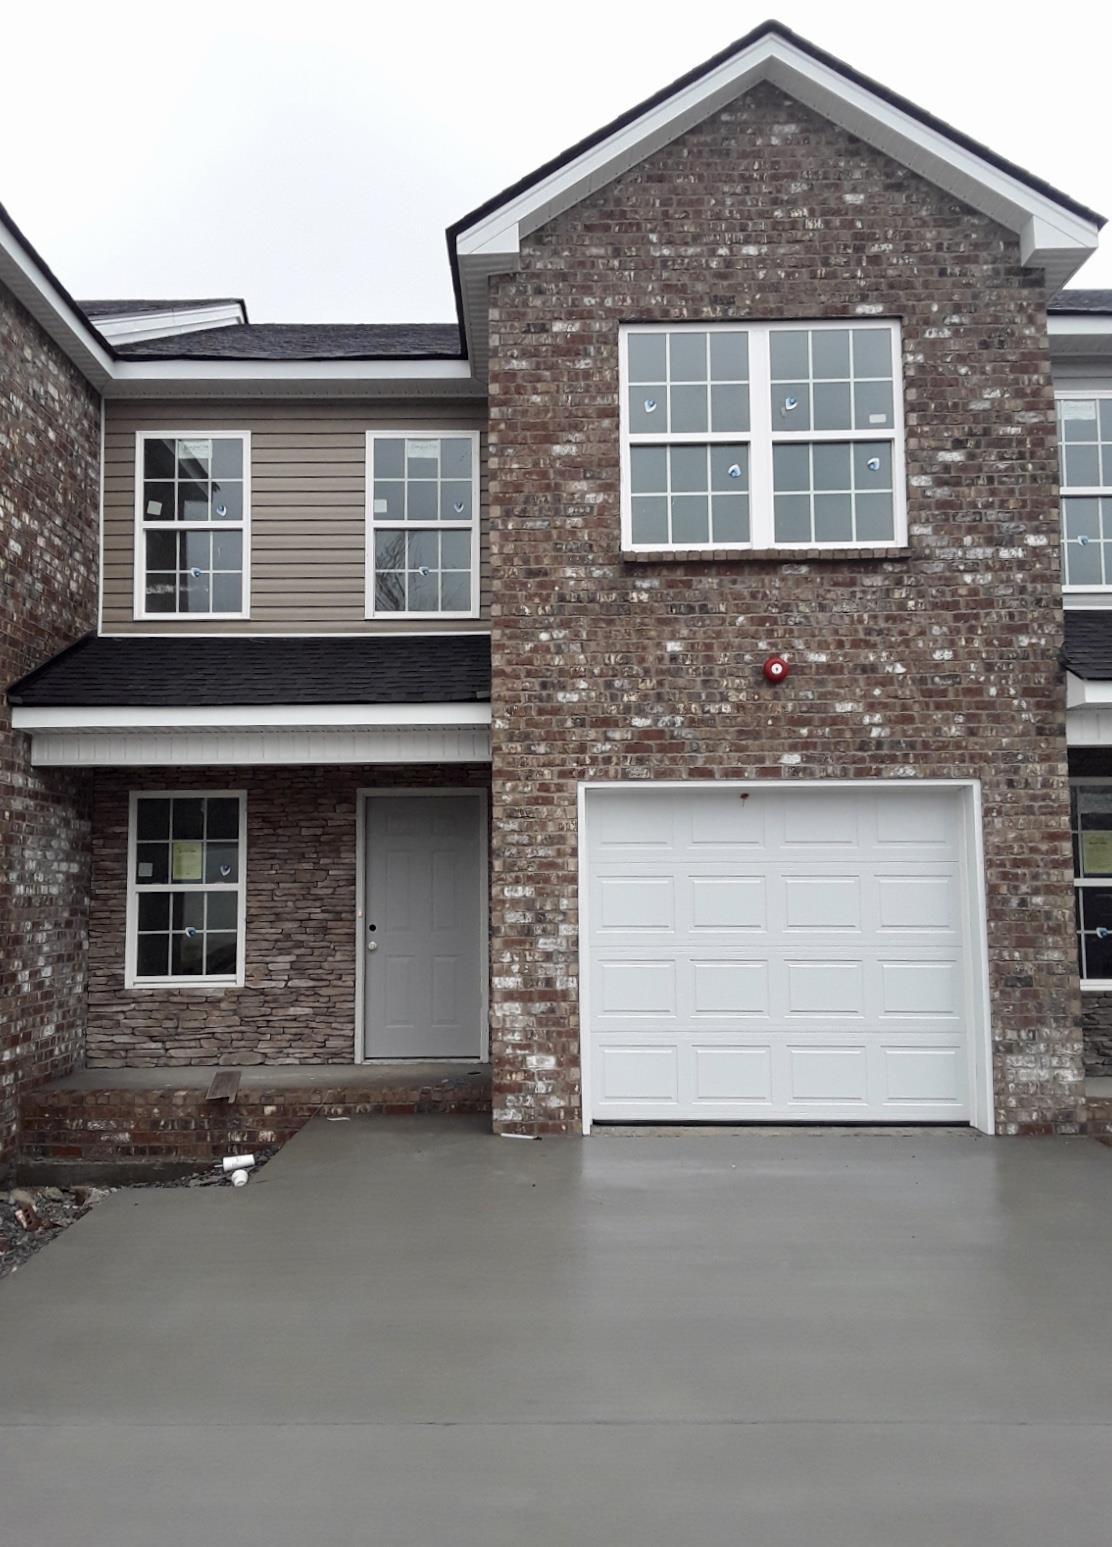 2039 Downstream Drive, Ashland City, TN 37015 - Ashland City, TN real estate listing